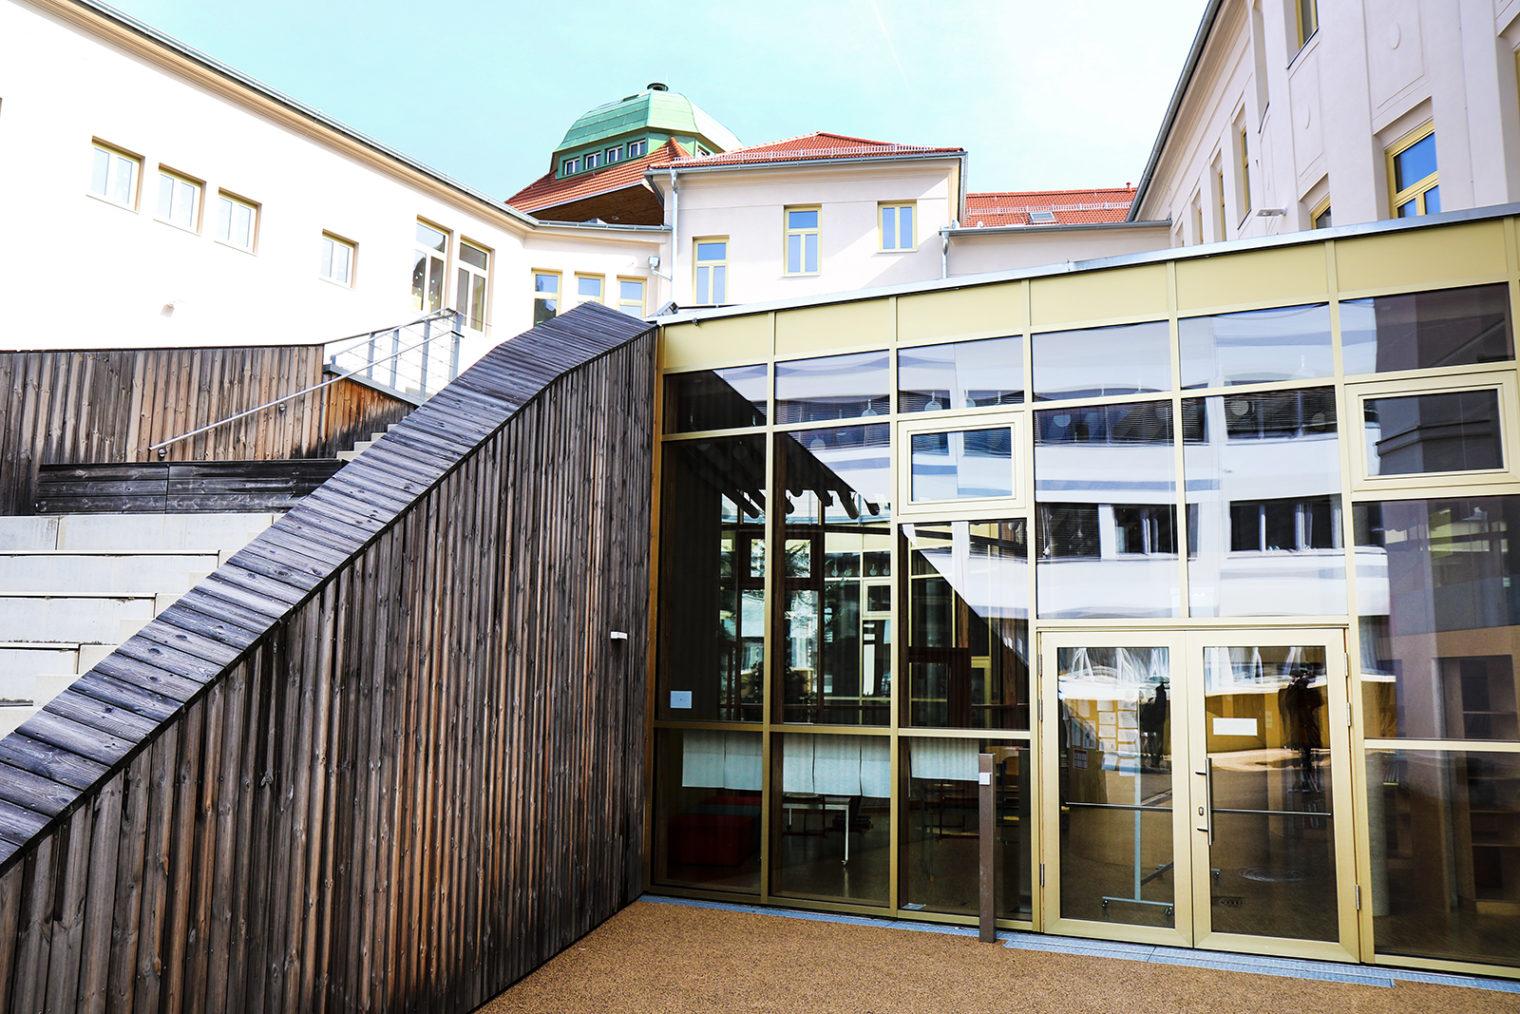 Primary school in the education center Pestalozzi